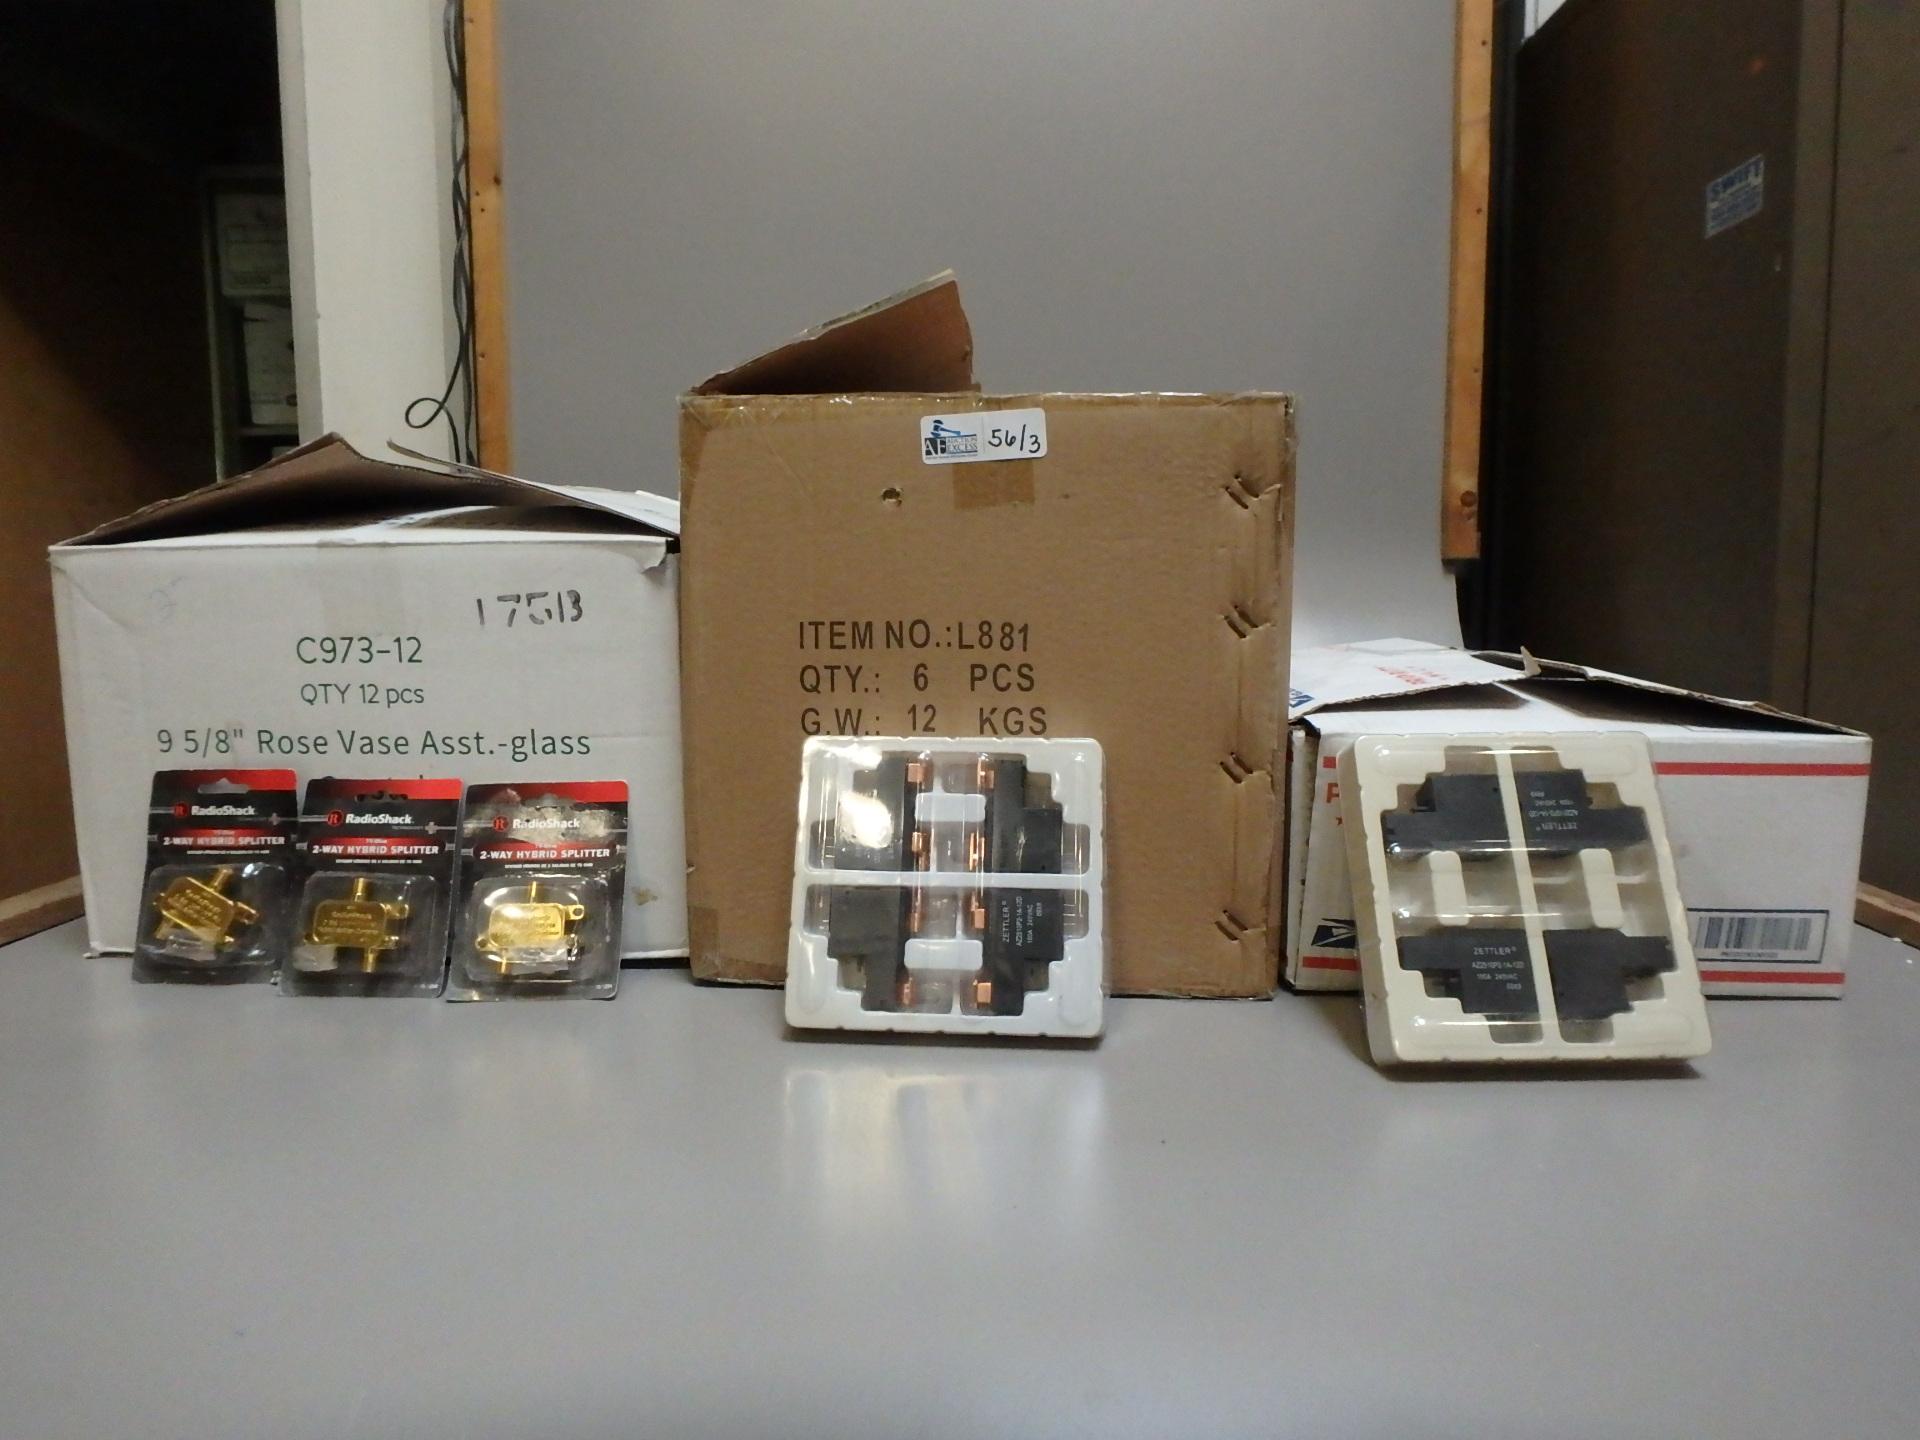 Lot 56 - 3 BOXES MISC